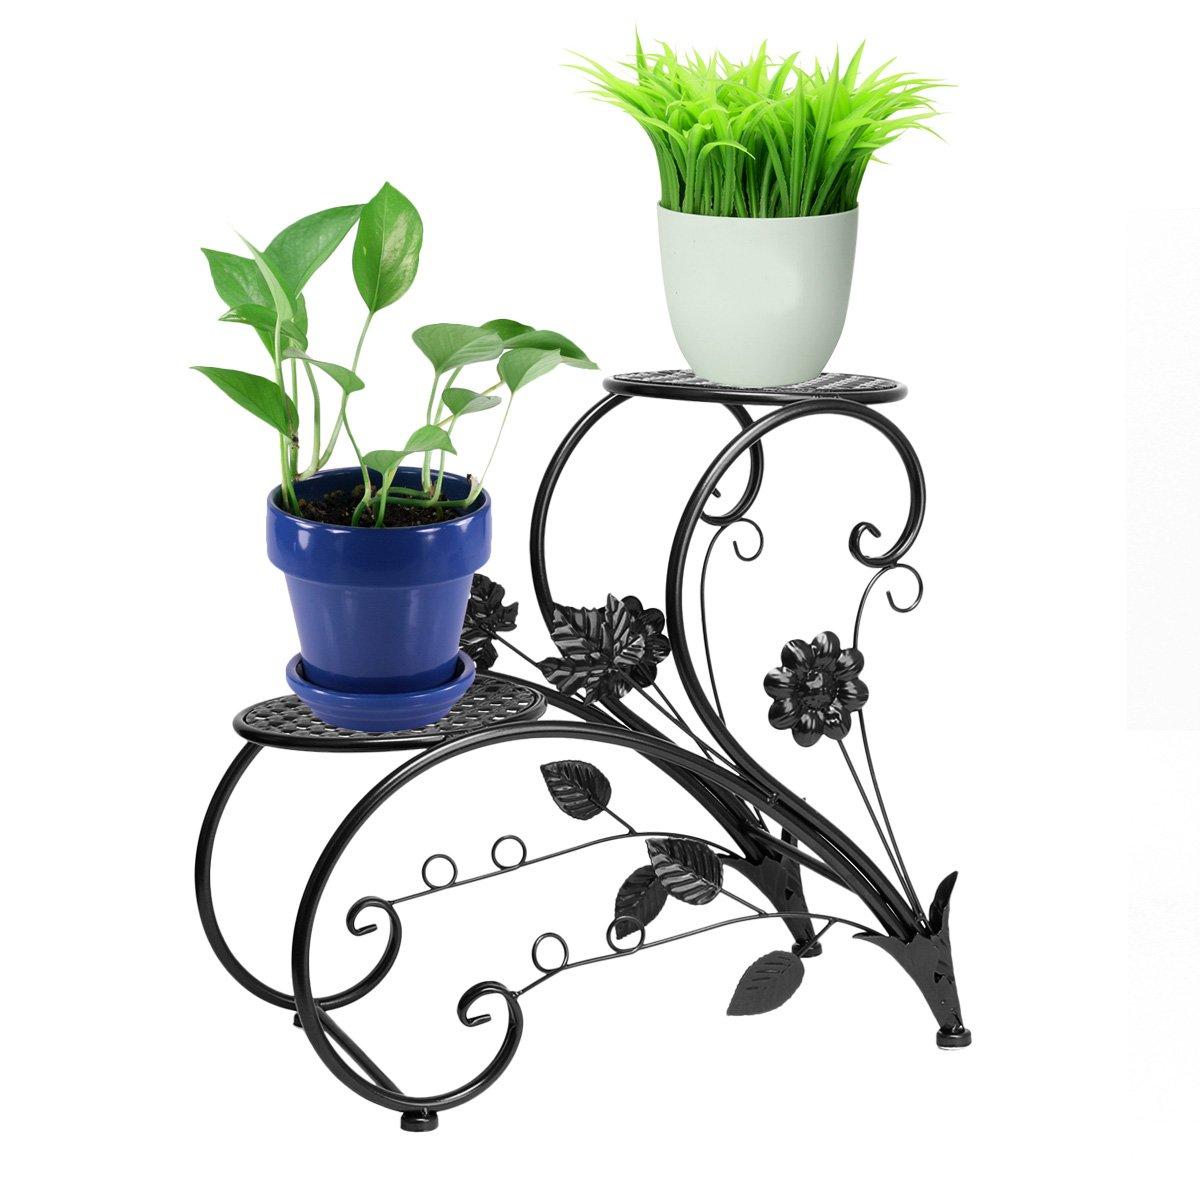 Dazone Iron Flower Pot Rack Home Garden Patio Decor Display Stand Bonsai Holder